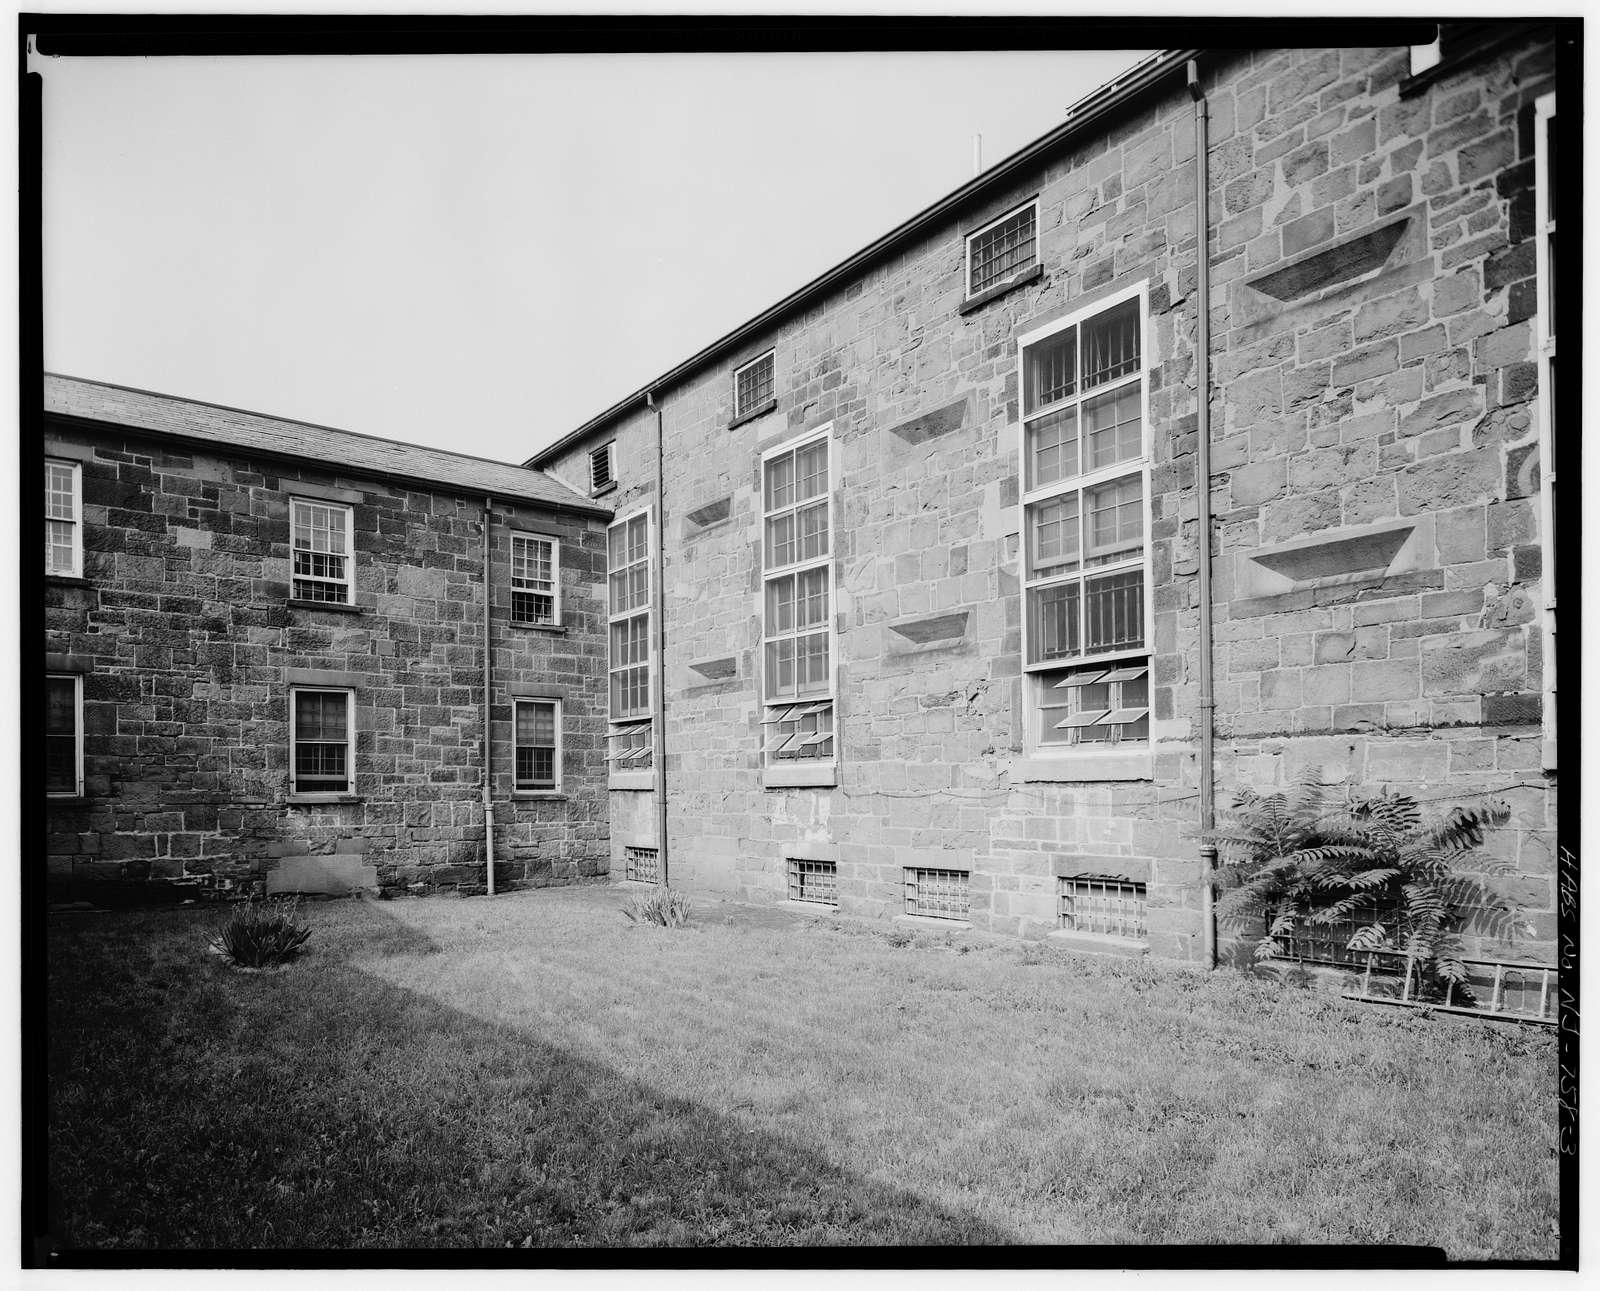 Essex County Jail, Newark, New & Wilsey Streets, Newark, Essex County, NJ